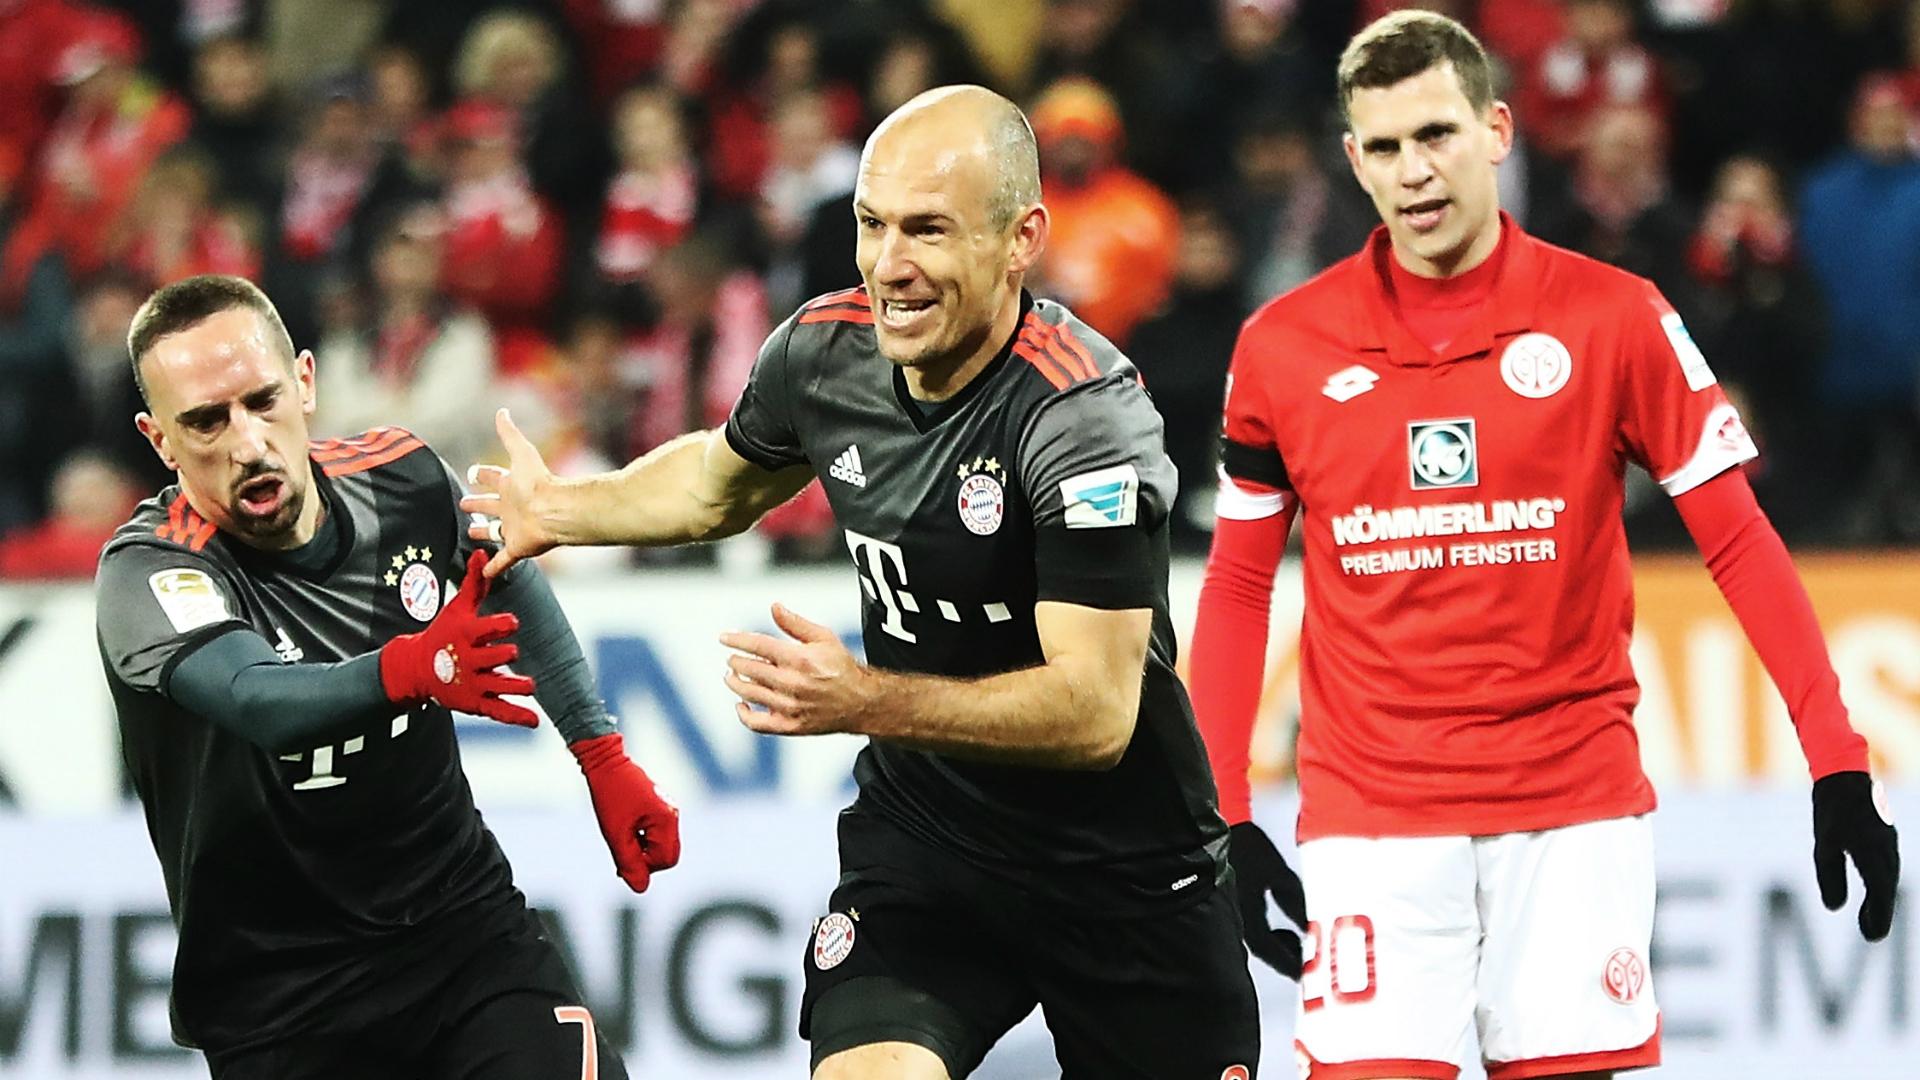 Bayern Munich beat Mainz in German Bundesliga